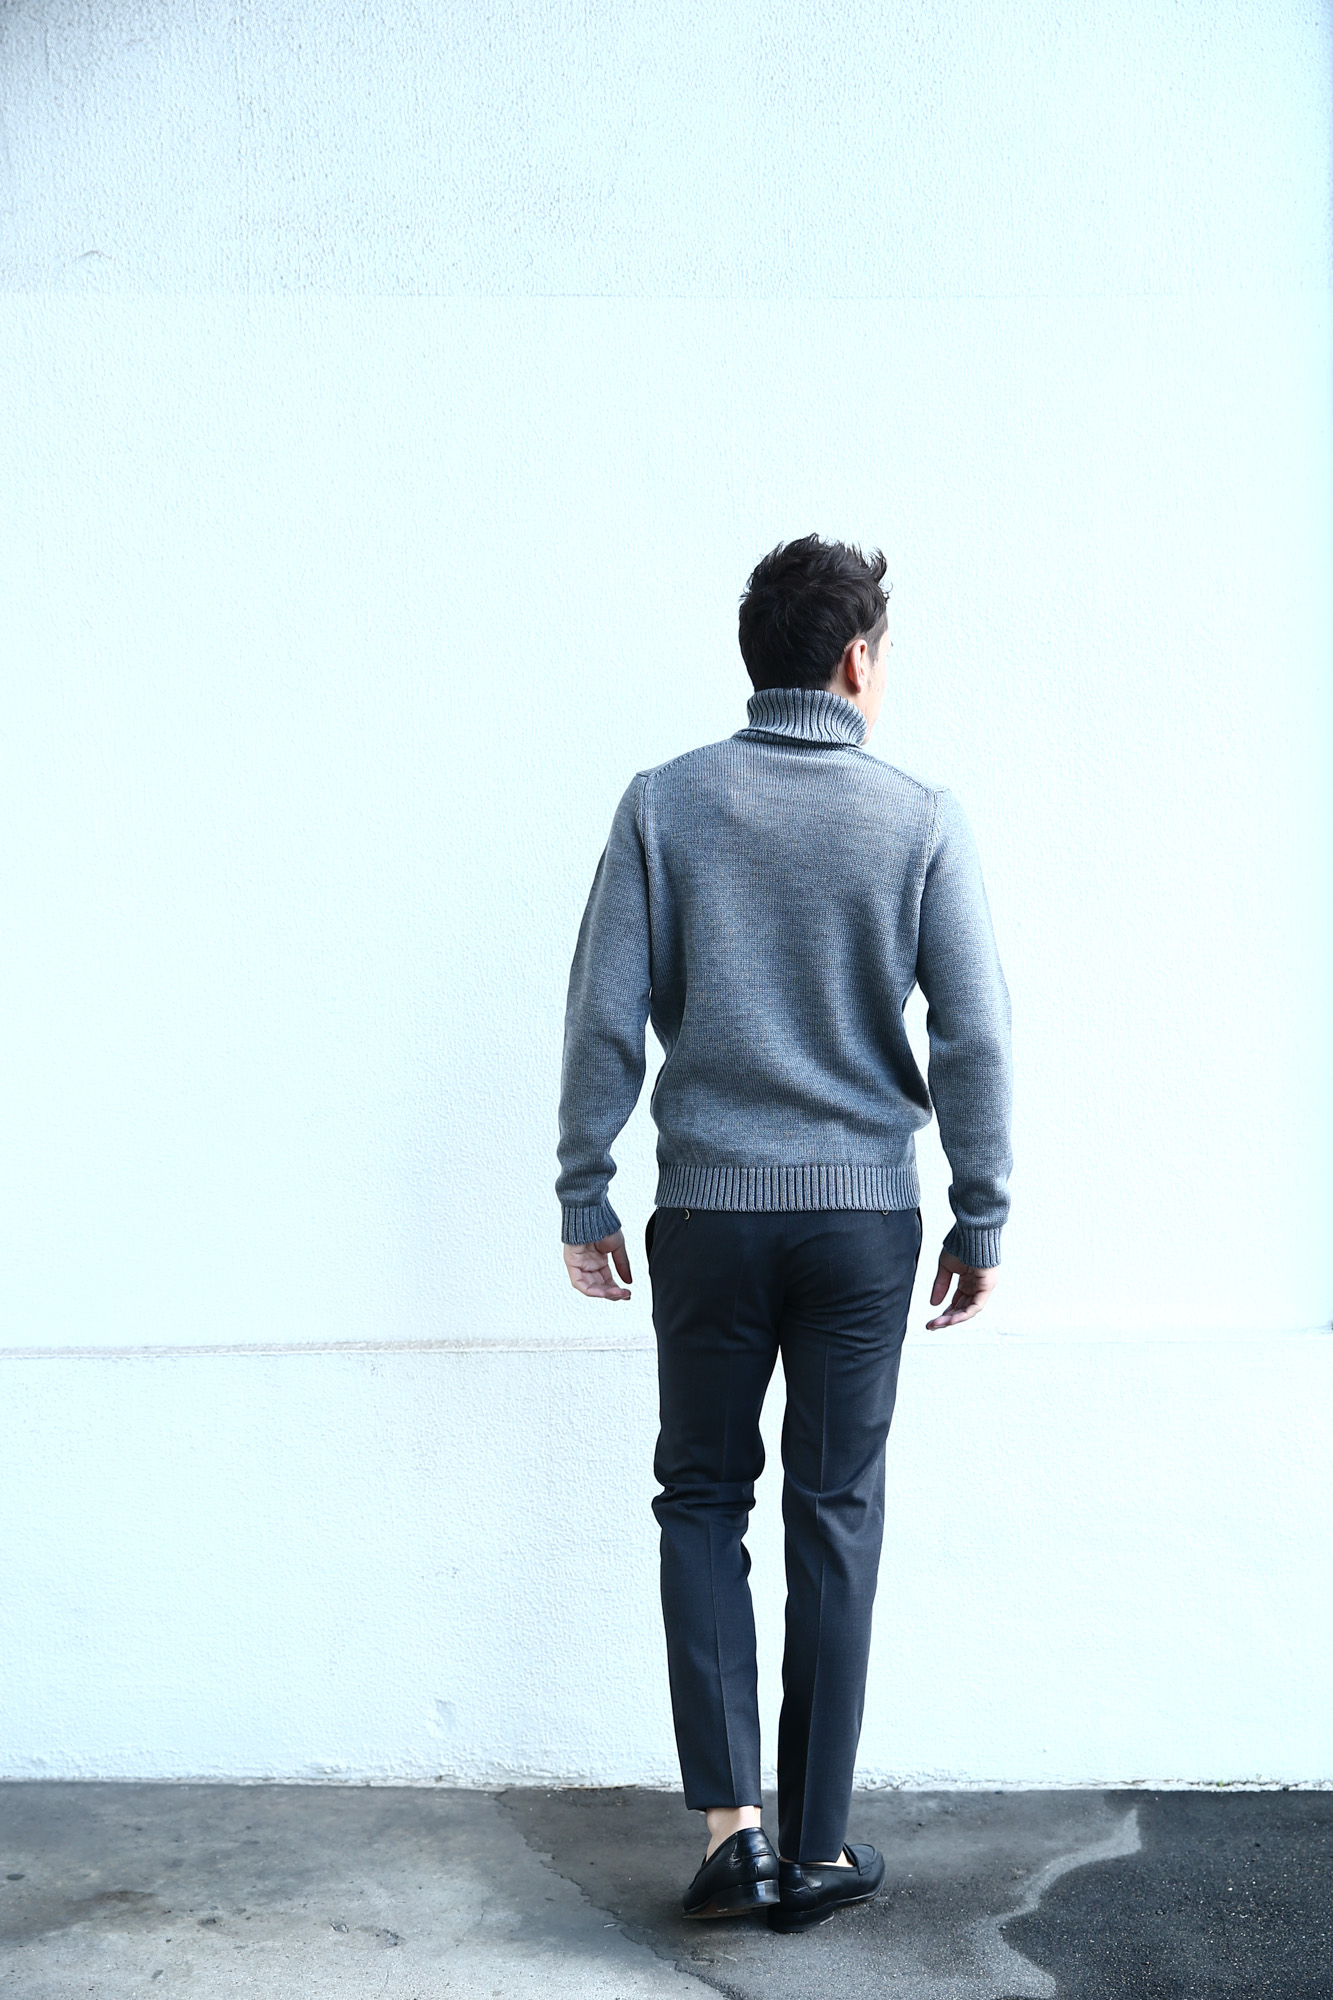 【PT01 / ピーティーゼロウーノ】 BUSINESS SUPER SLIM FIT (スーパースリムフィット) ストレッチ トロピカル サマーウール スラックス CHARCOAL GRAY (チャコールグレー・0255) 2018 春夏新作 pt01 ピーティー 愛知 名古屋 ZODIAC ゾディアック